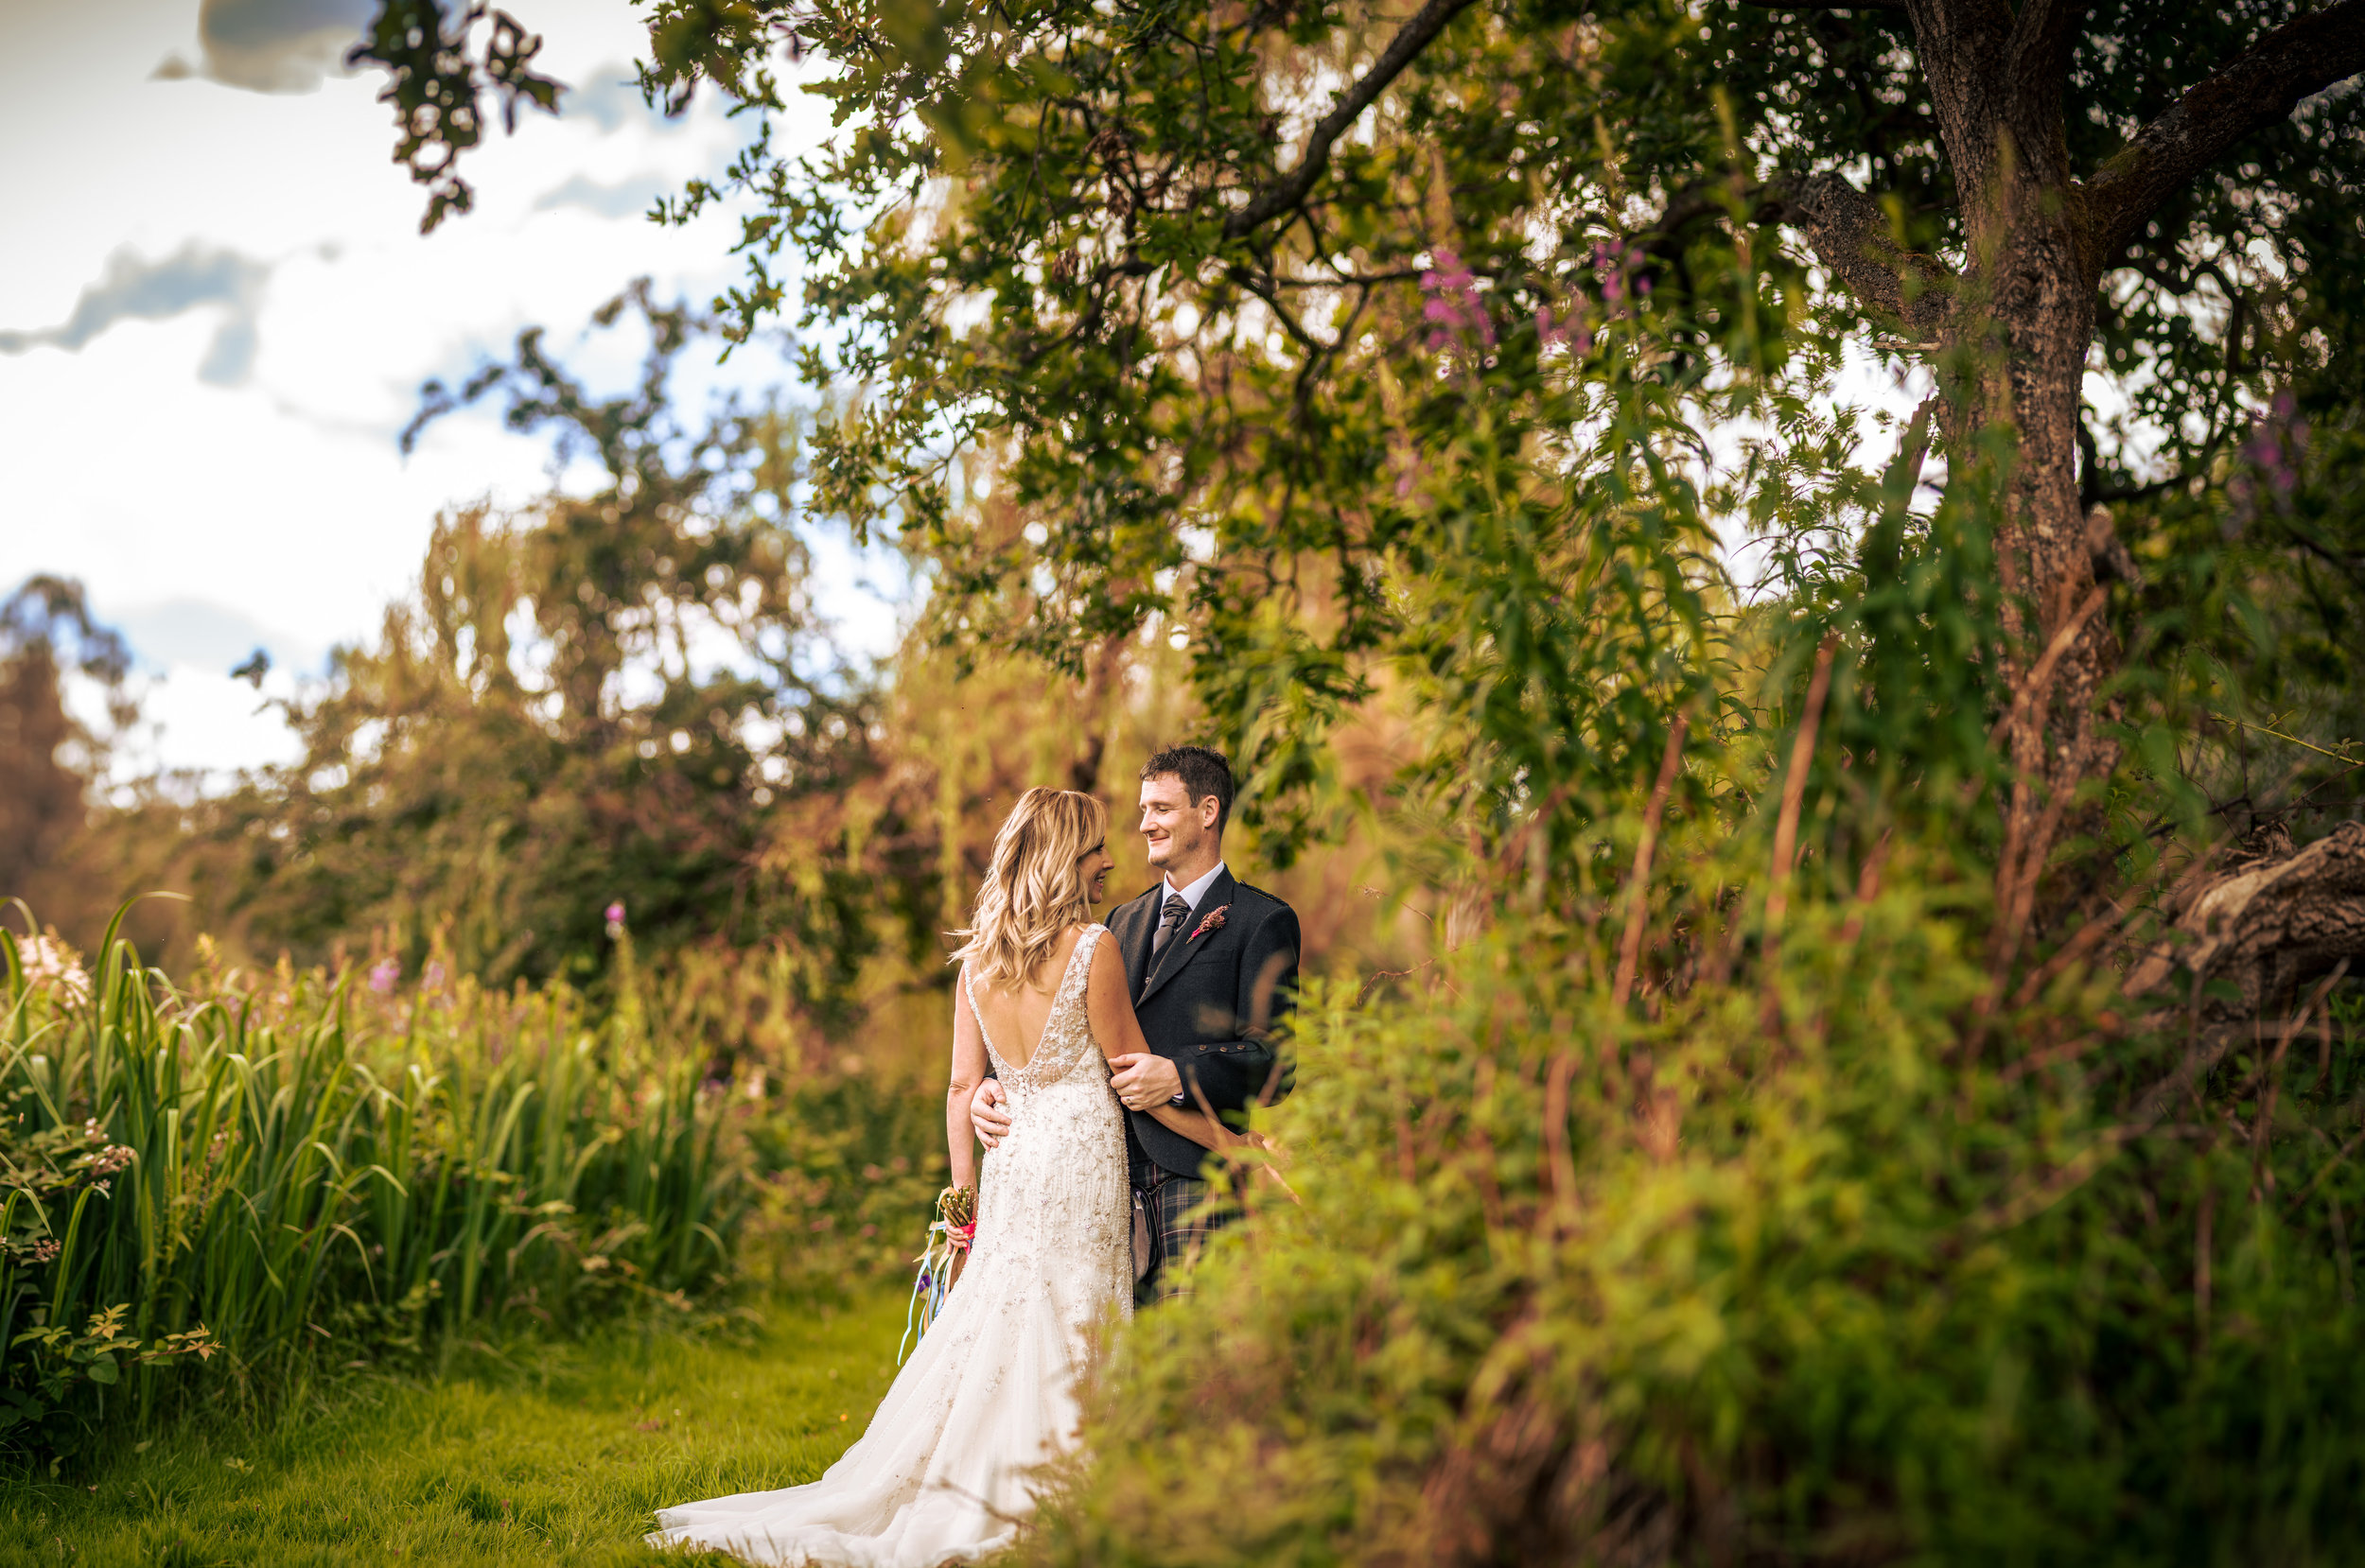 castle-wedding-venues-near-edinburgh-(3).jpg